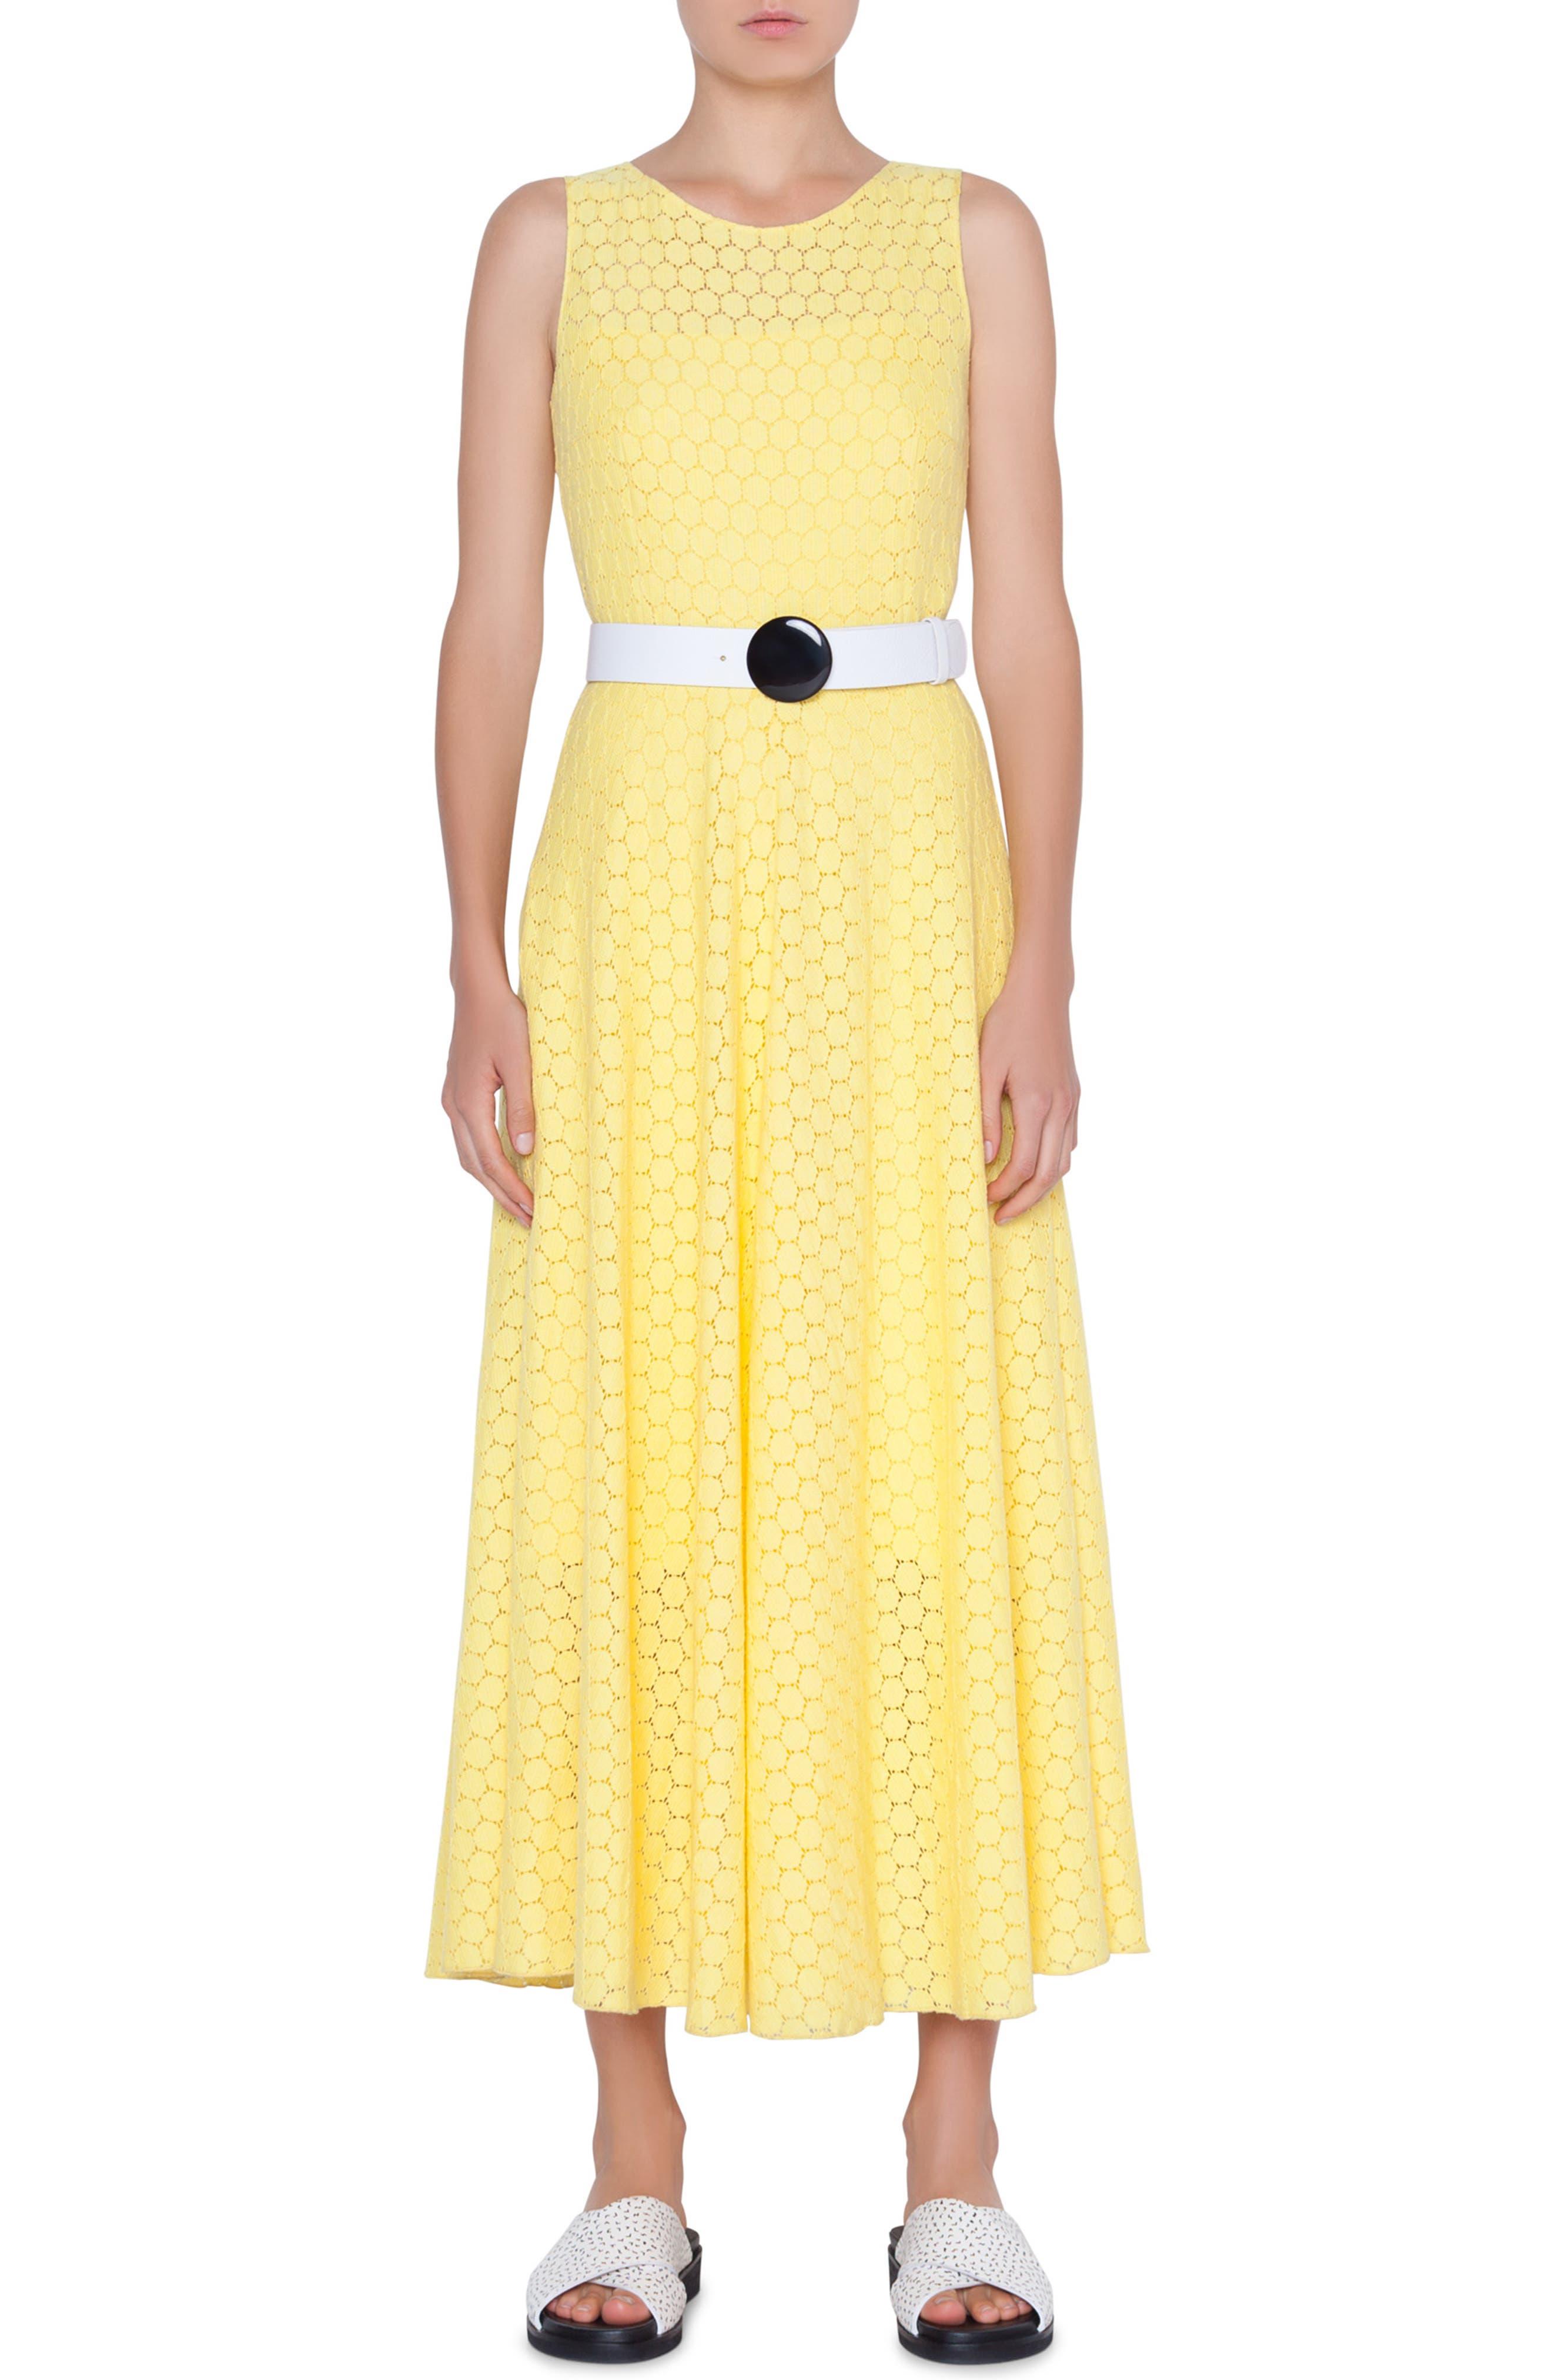 AKRIS PUNTO Belted Lace Dress, Main, color, LIMONE